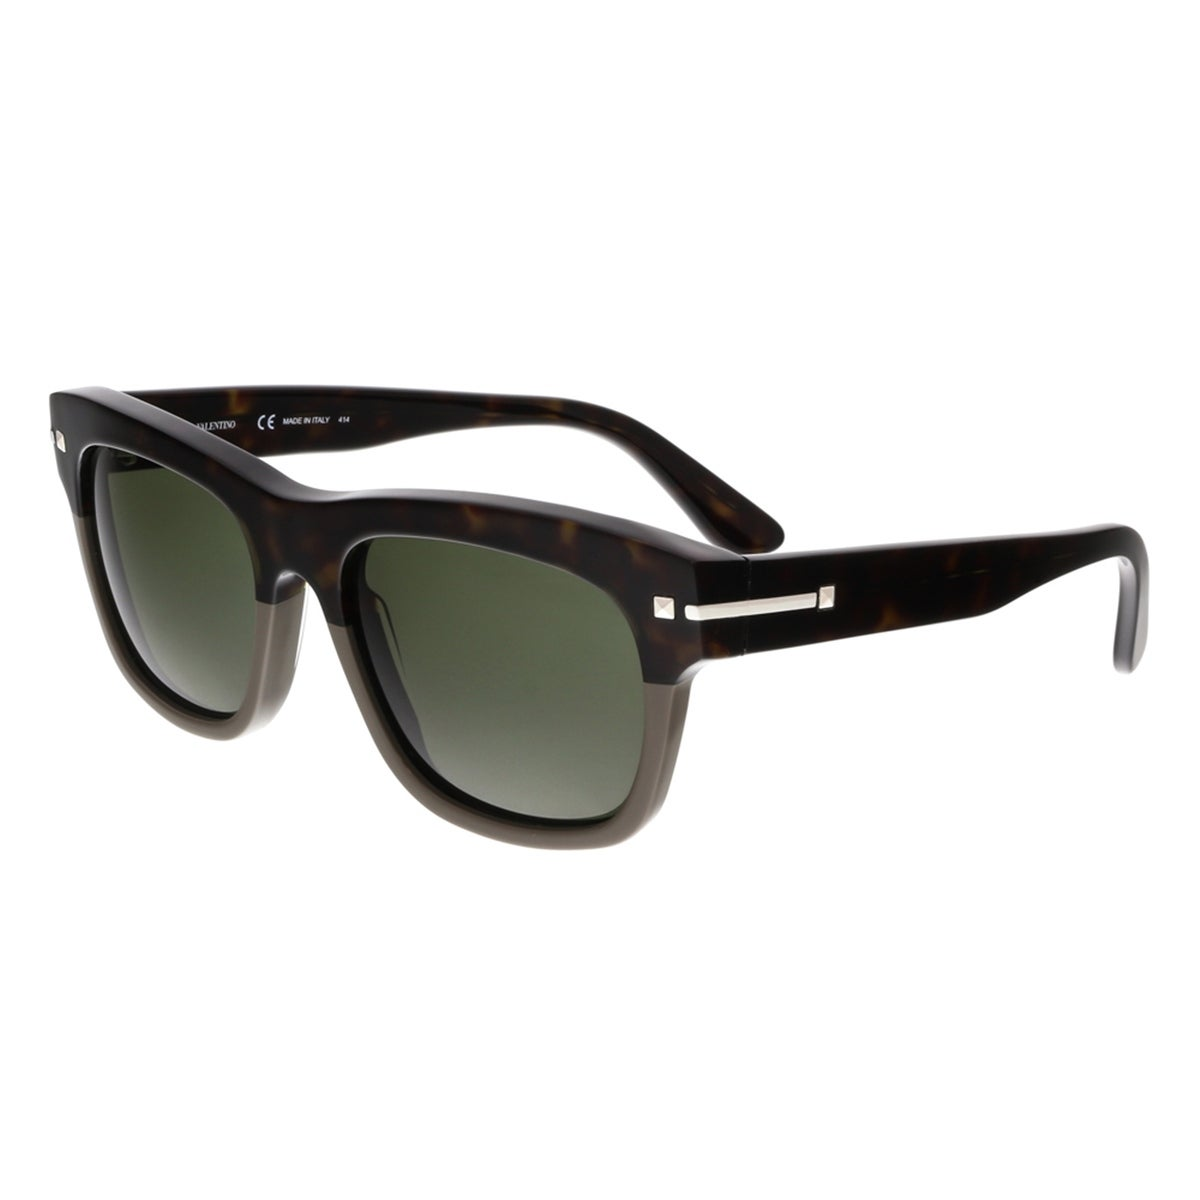 be9a9bcb3ec Shop Valentino V703S 245 Dark Havana Wayfarer Sunglasses - 53-19-145 ...